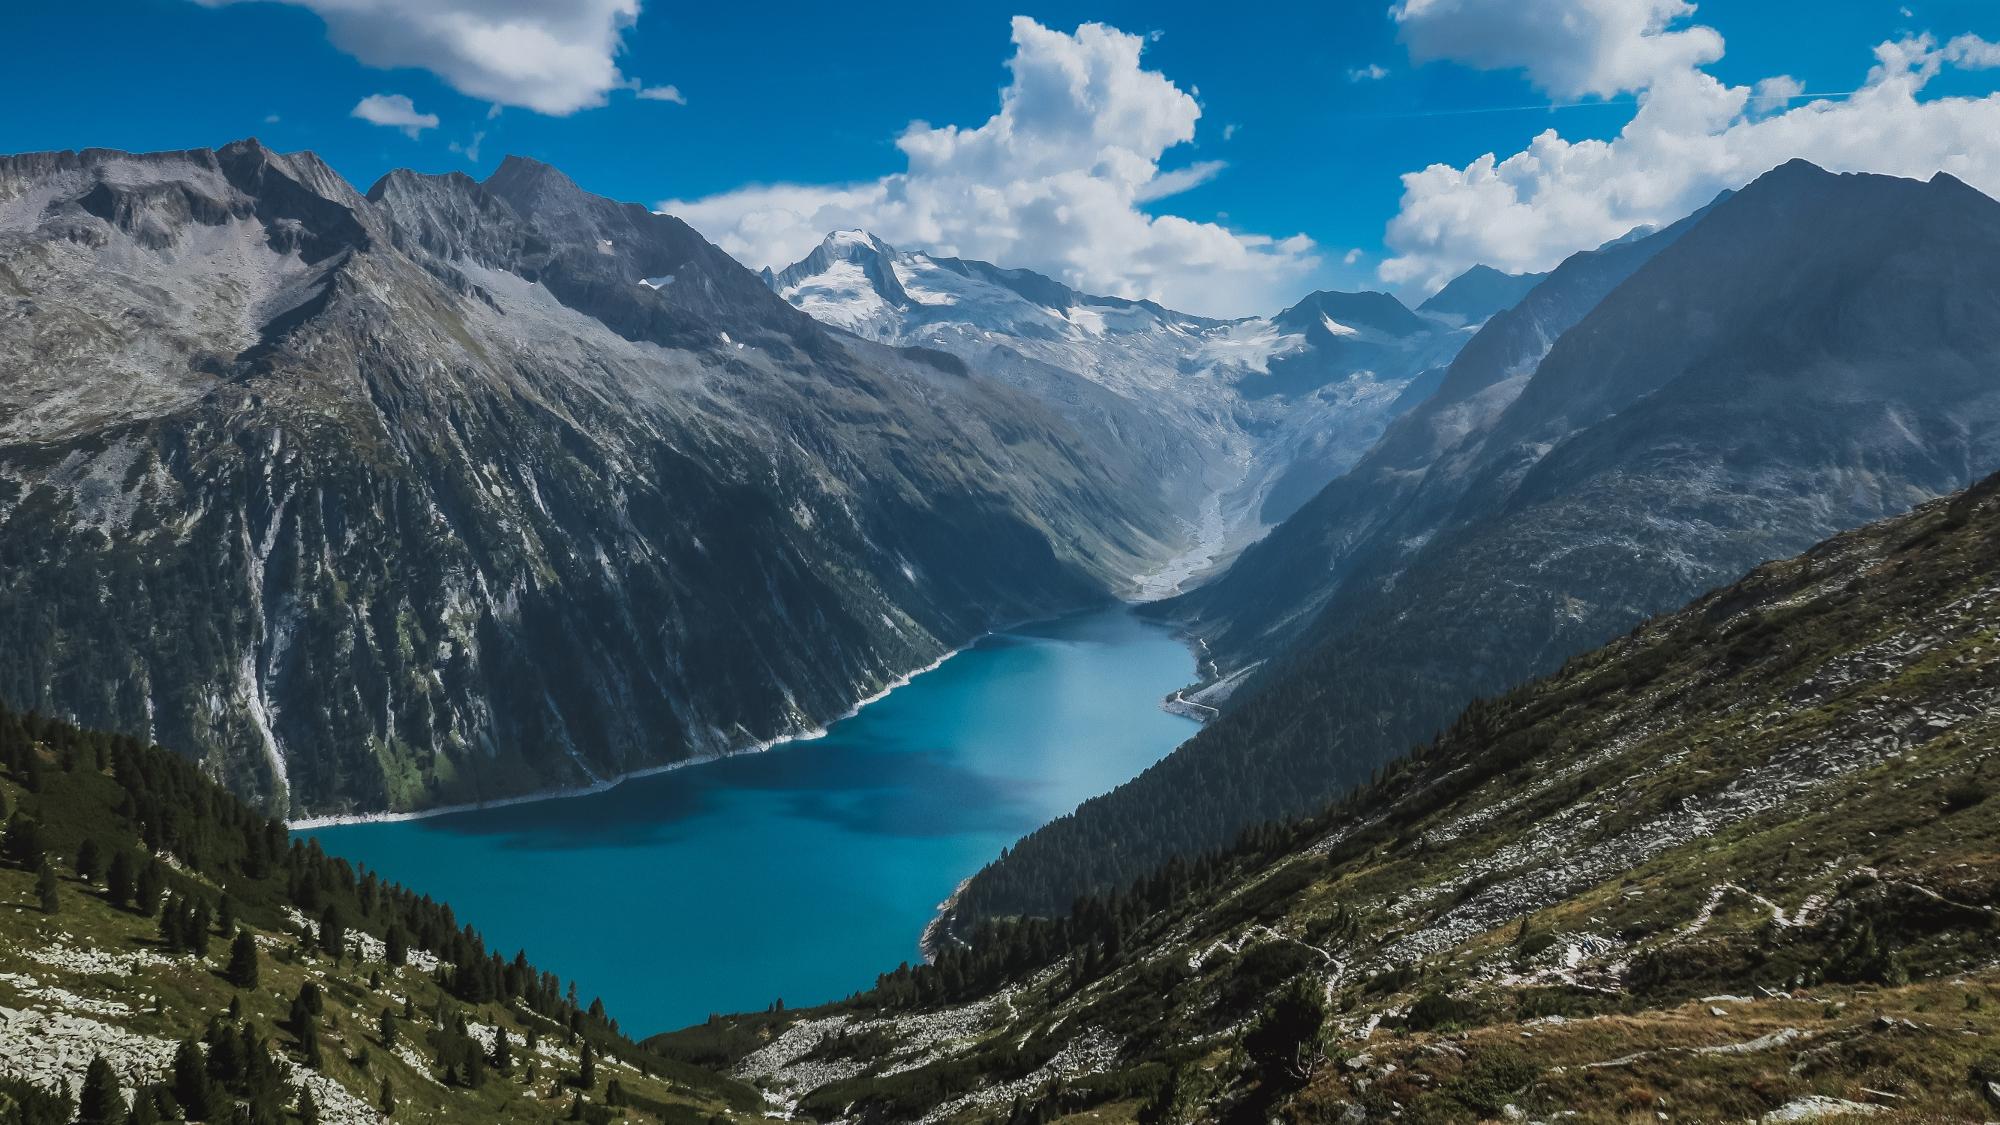 alps alpen mountain mountains berg berge see lake primetimechaos